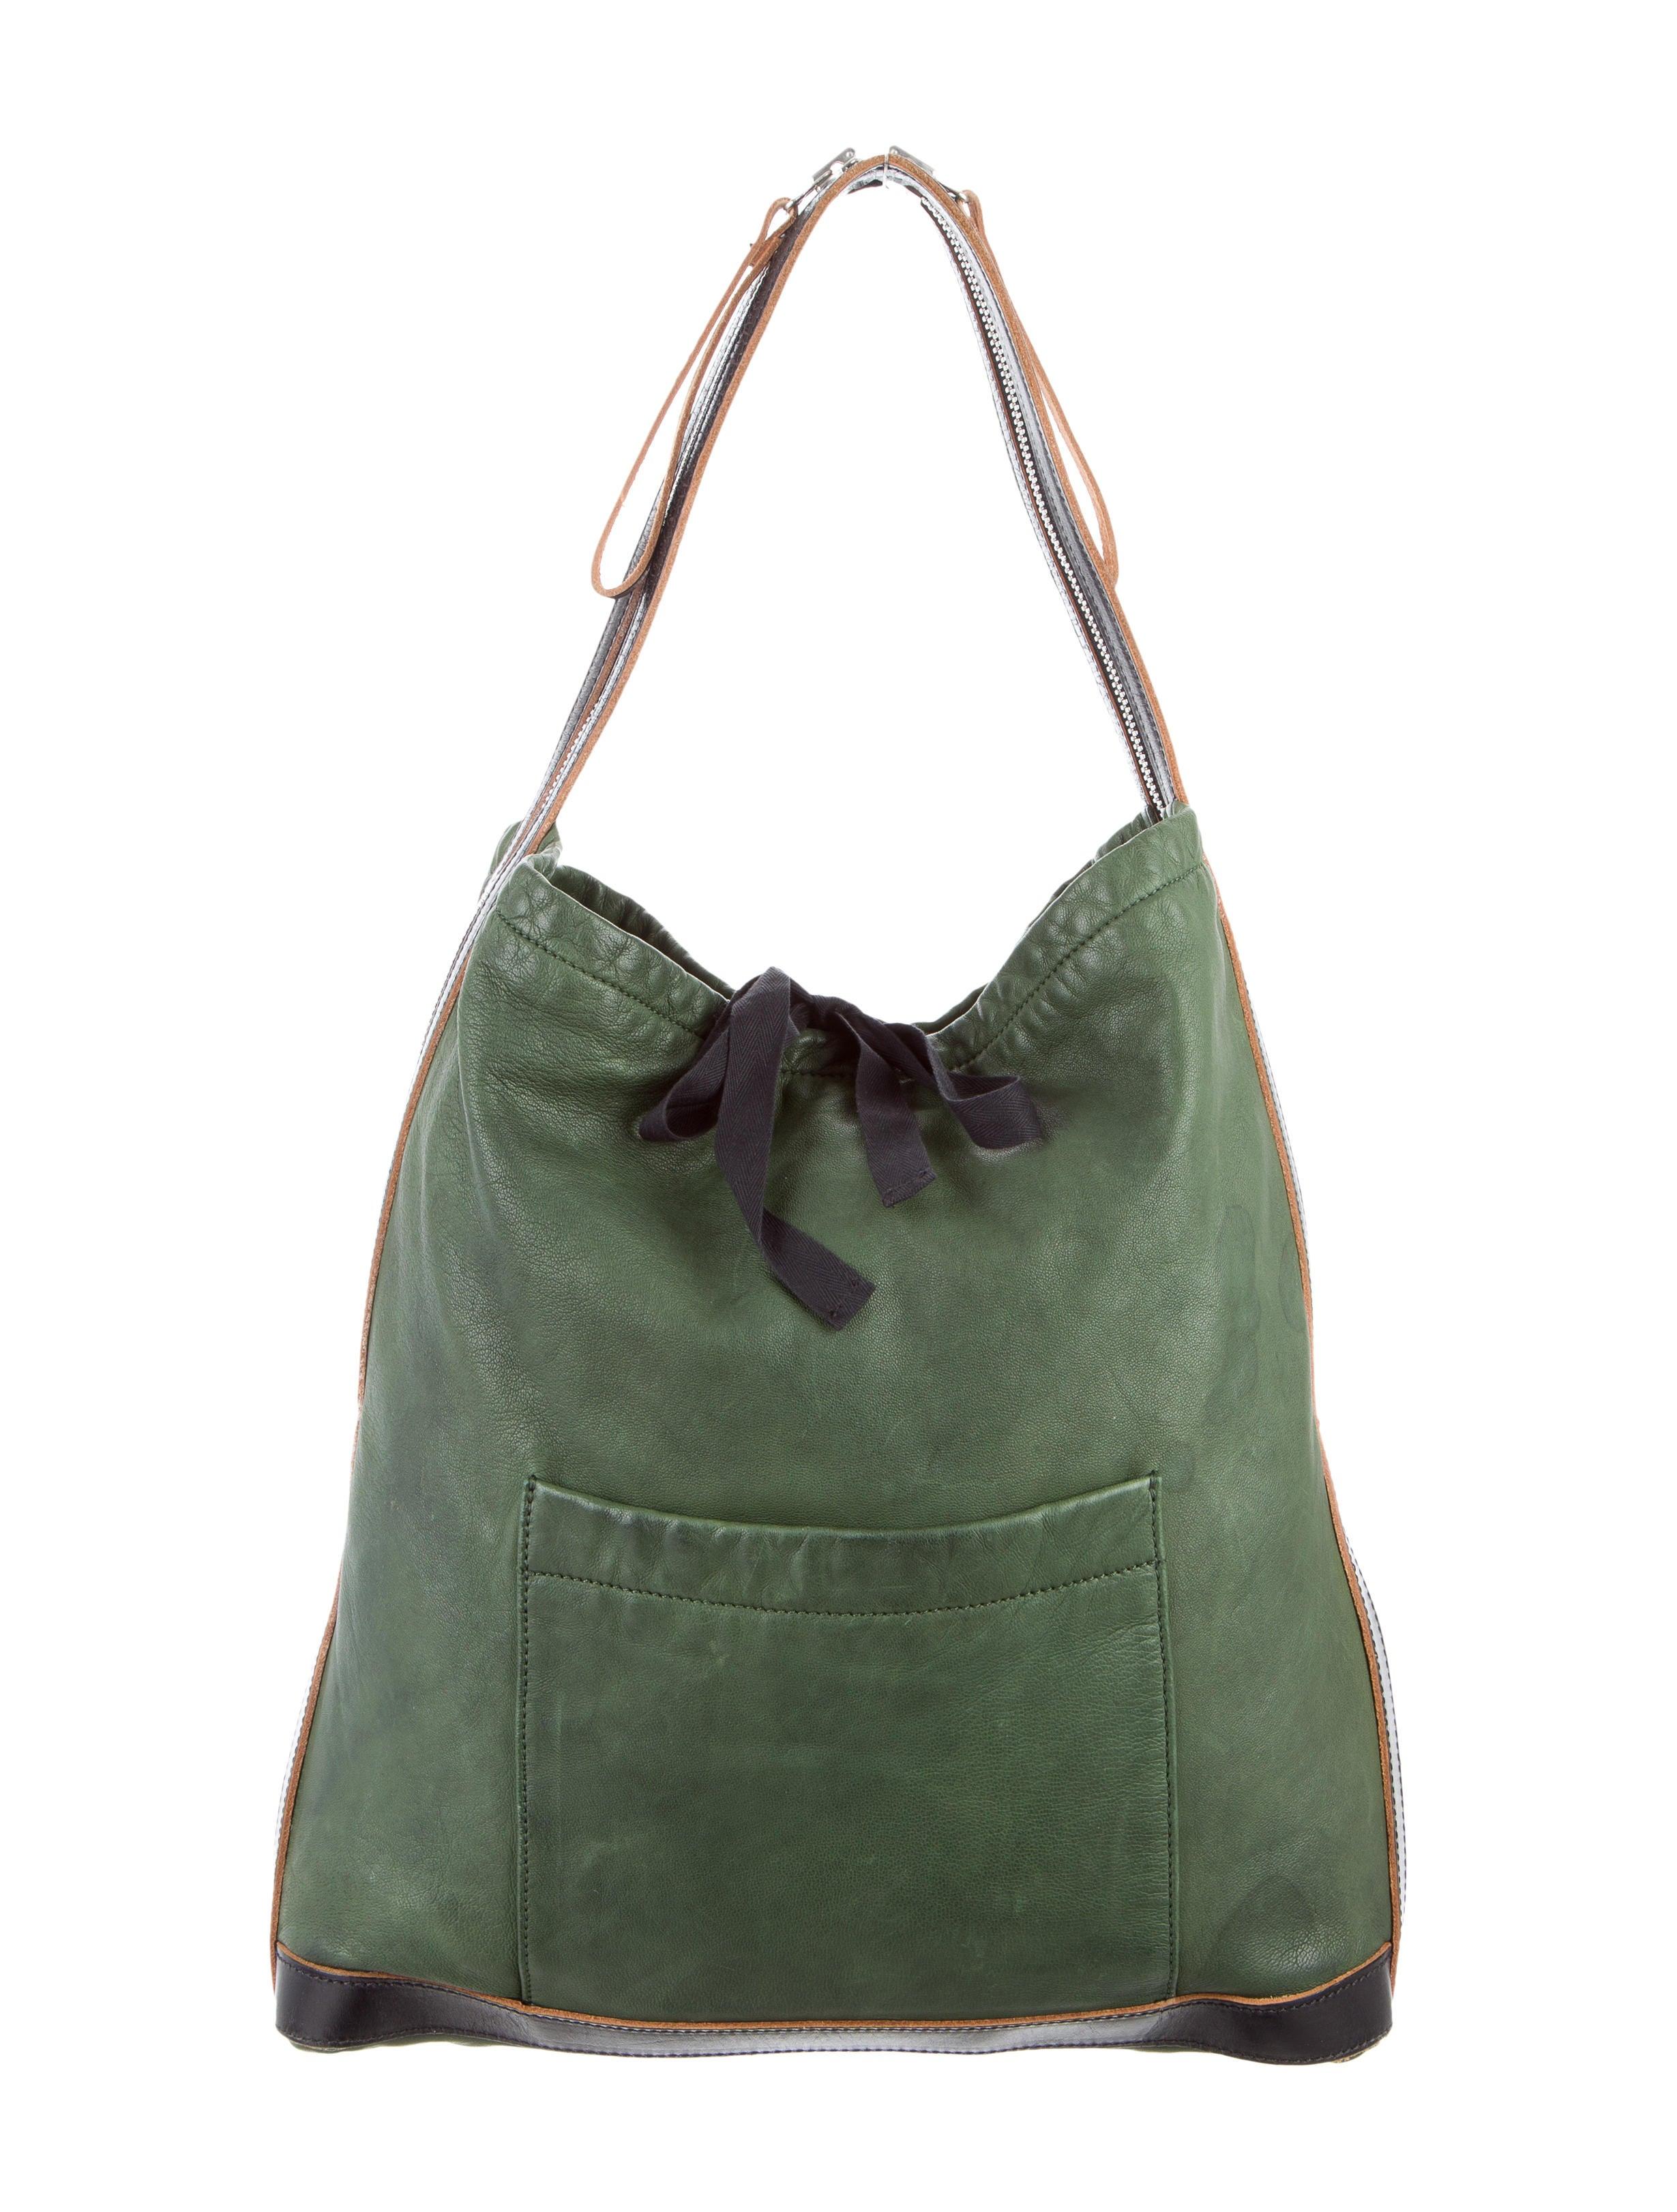 Marni Bicolor Hobo Bag Handbags MAN53589 The RealReal : MAN535891enlarged from www.therealreal.com size 2459 x 3244 jpeg 572kB